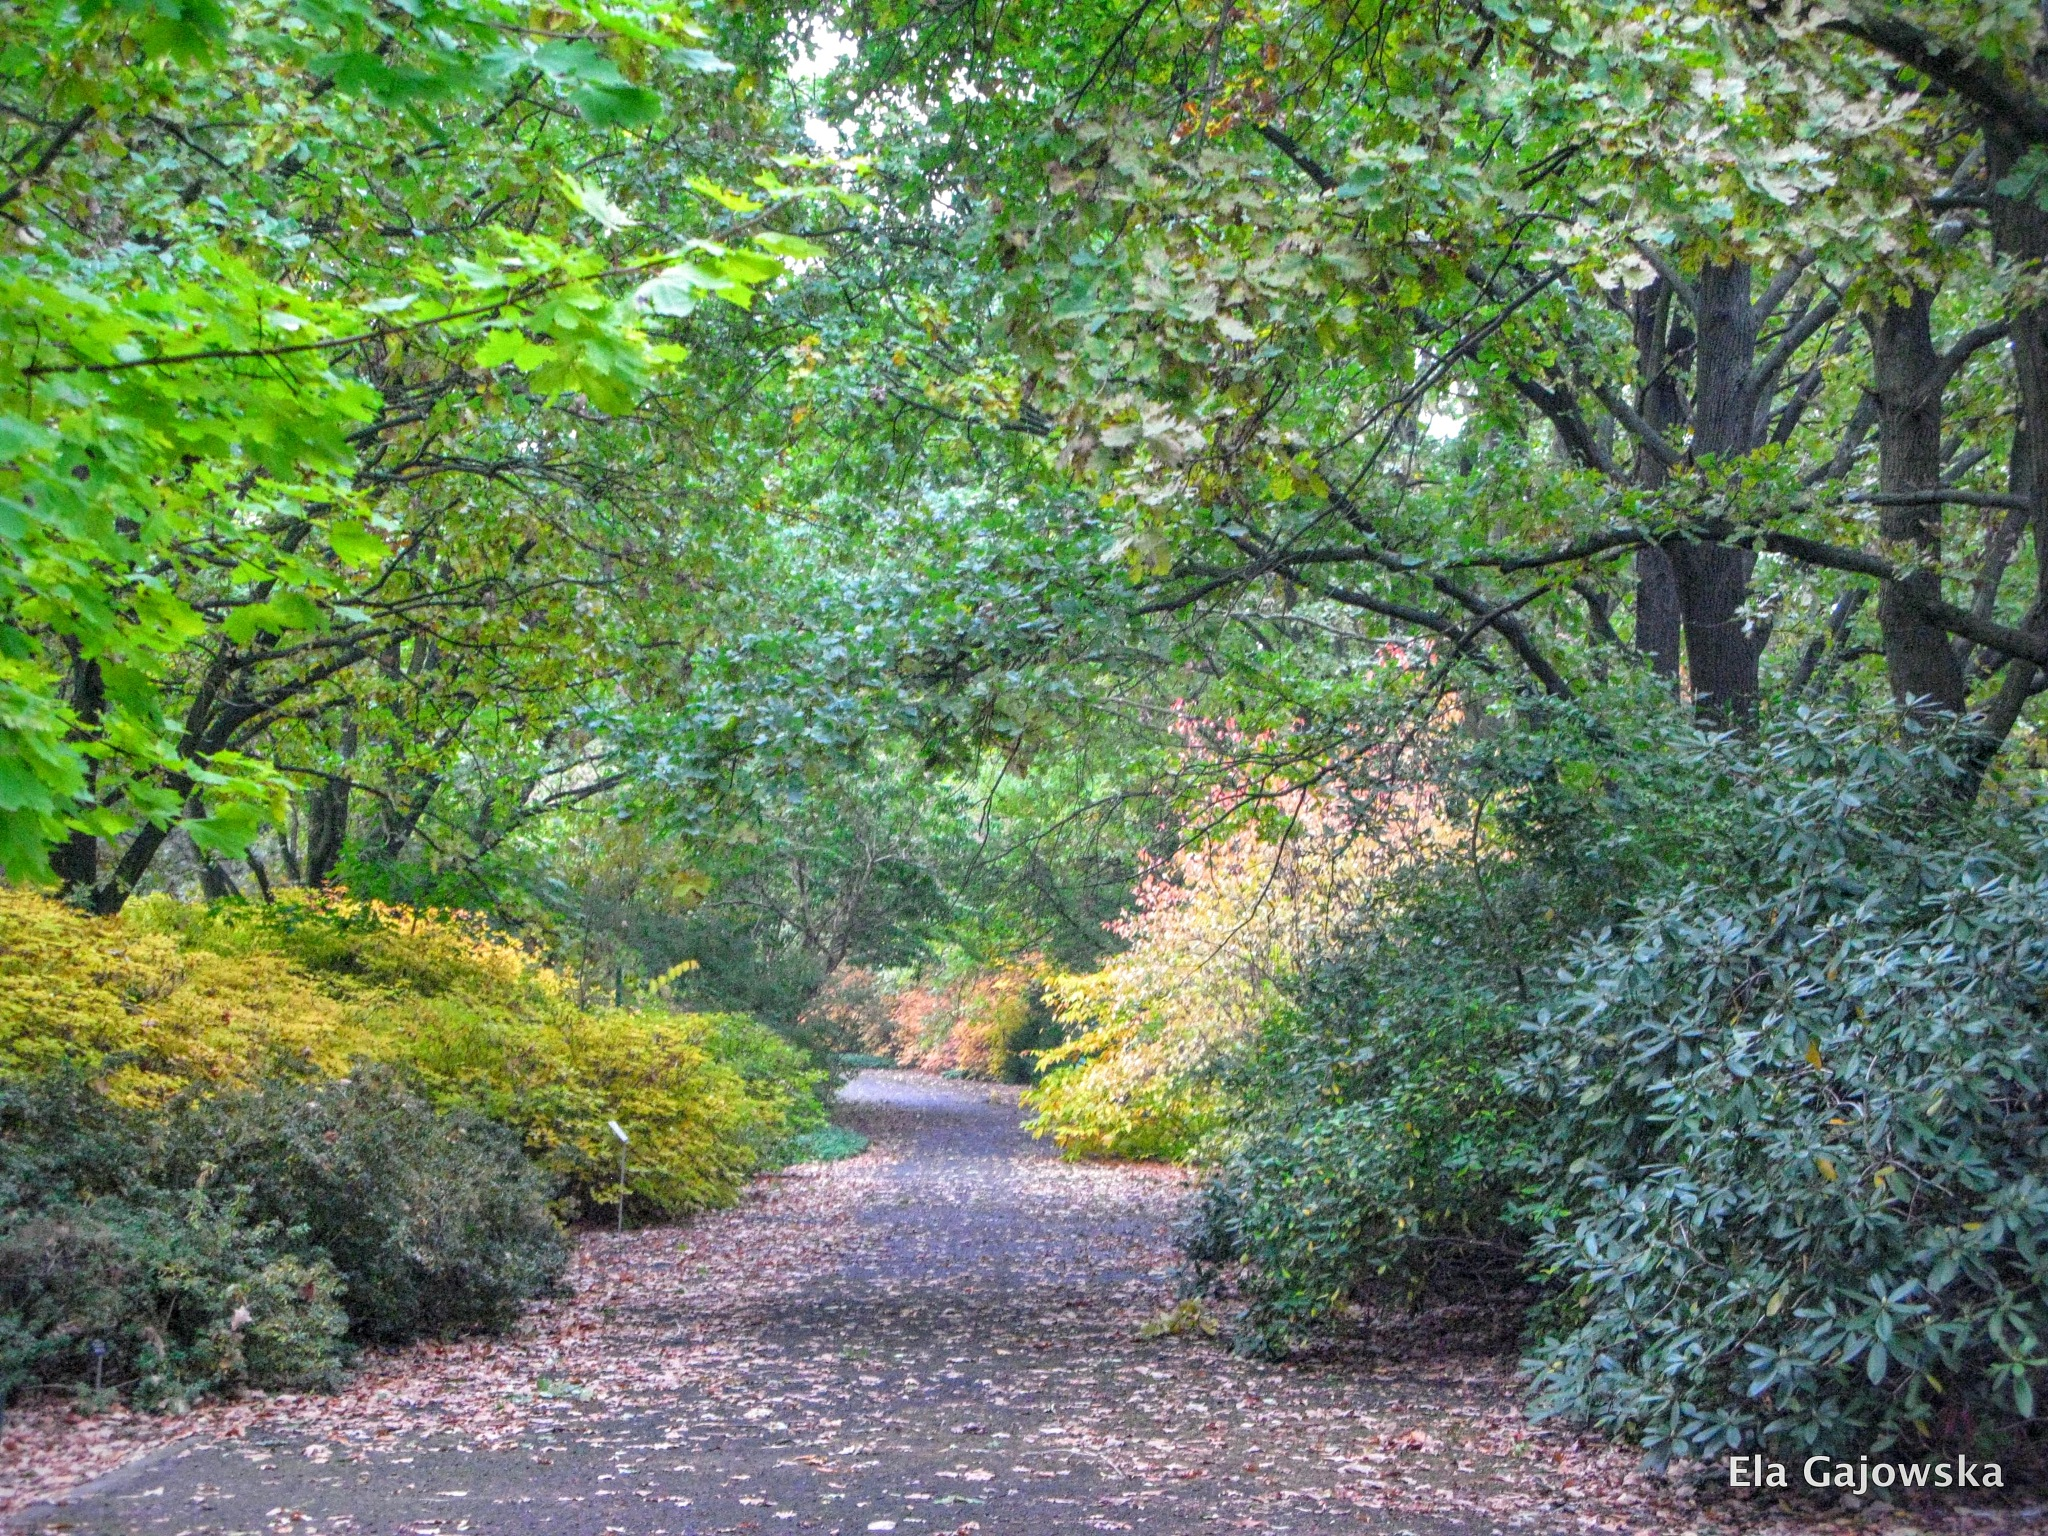 Autumn in the botanic garden by Ela Gajowska